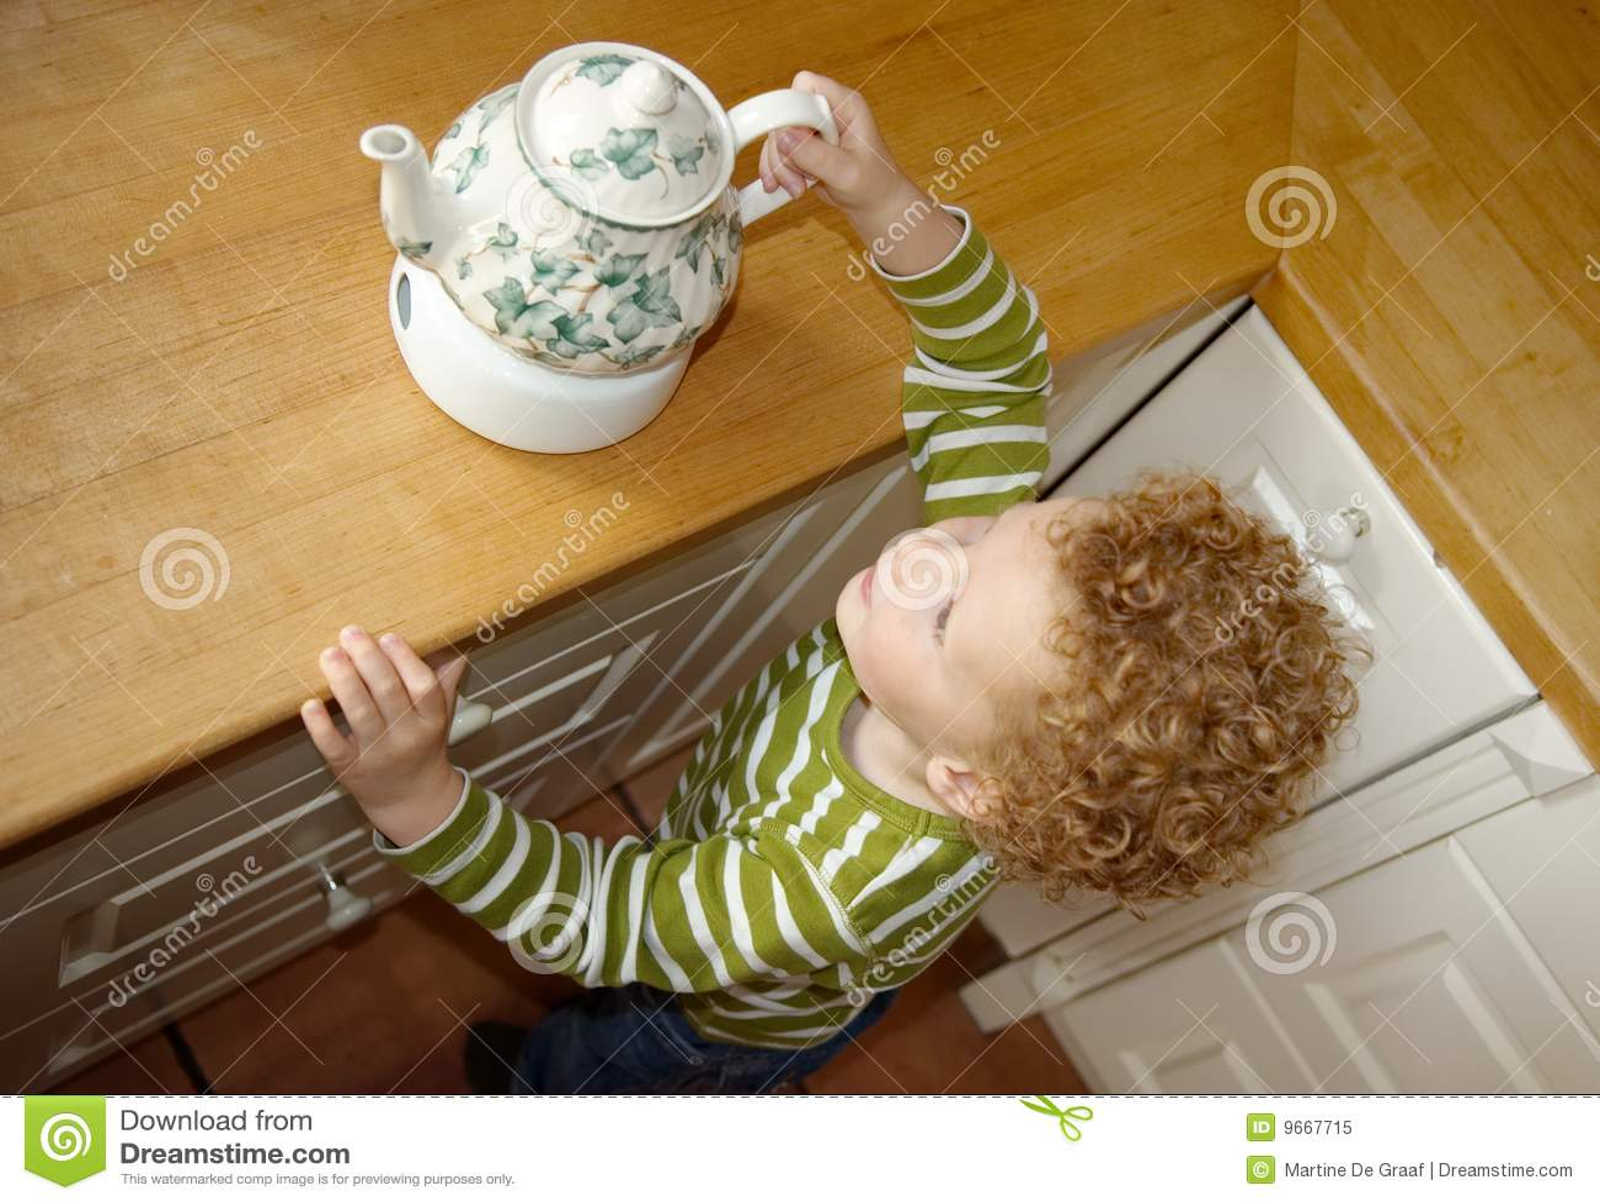 Child taking Teapot